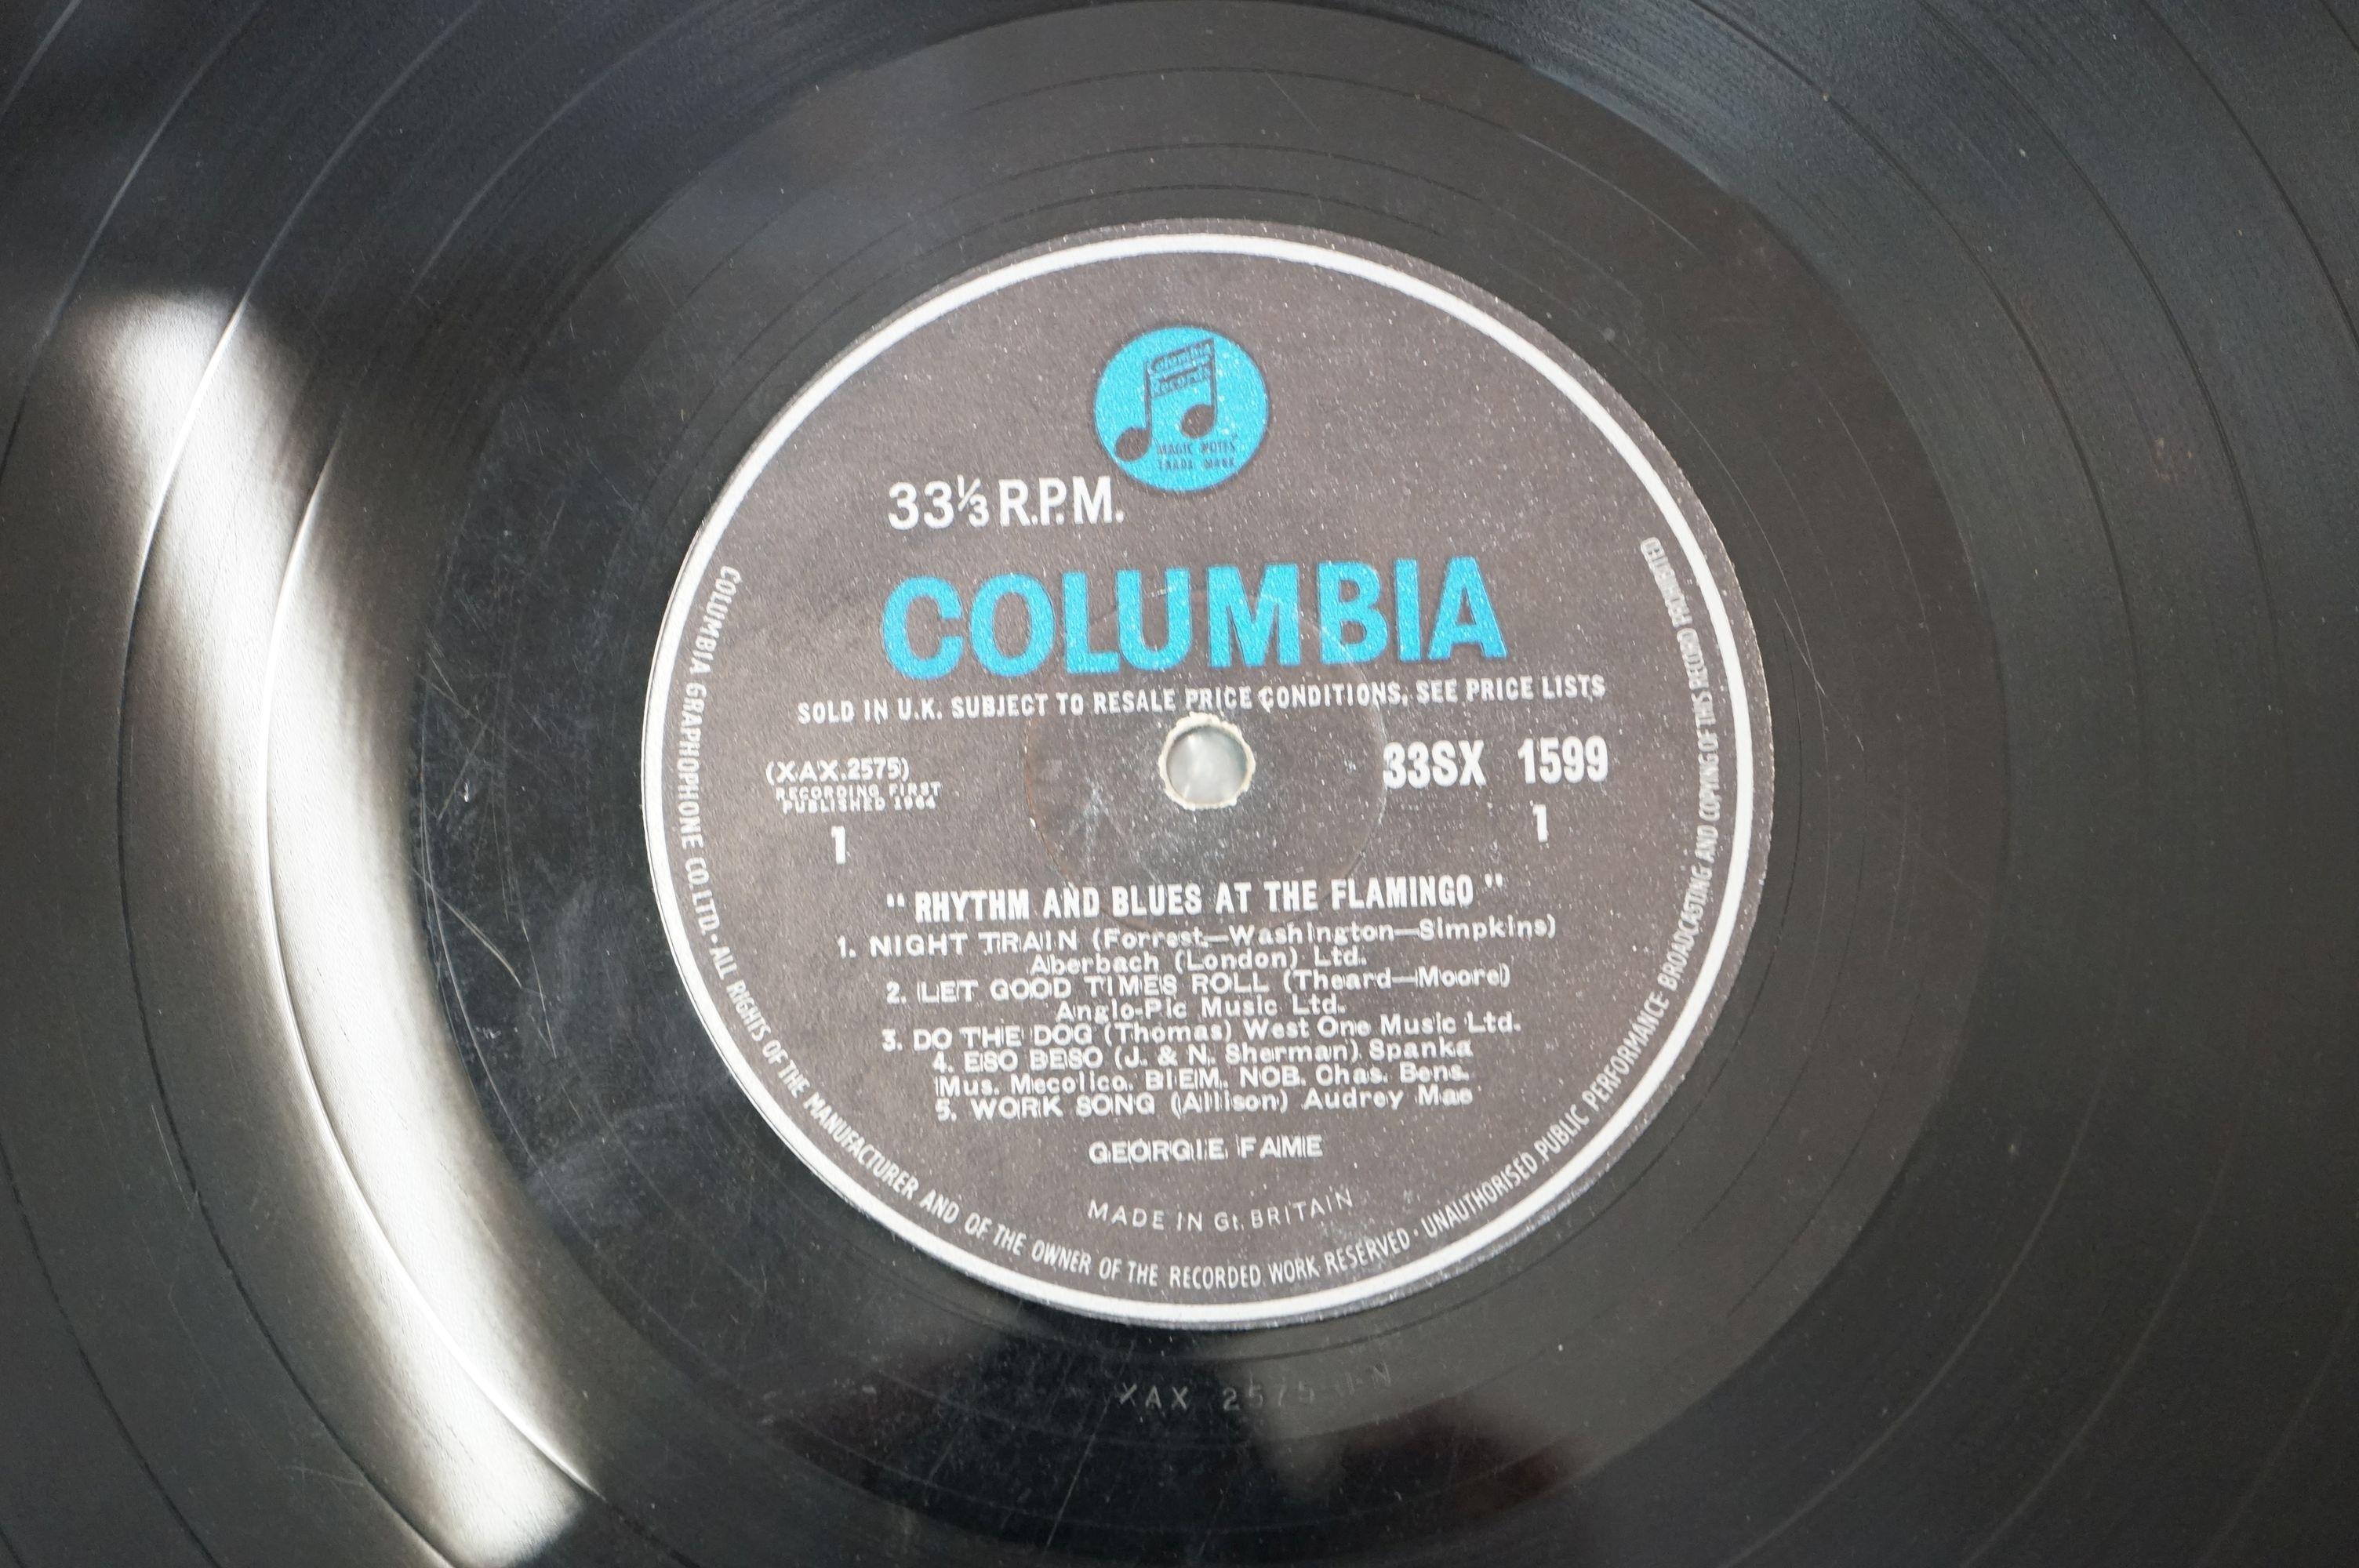 Vinyl - Georgie Fame Rhythm And Blues At The Flamingo (Columbia 33 SX 1599). Sleeve & Vinyl VG- - Image 4 of 4